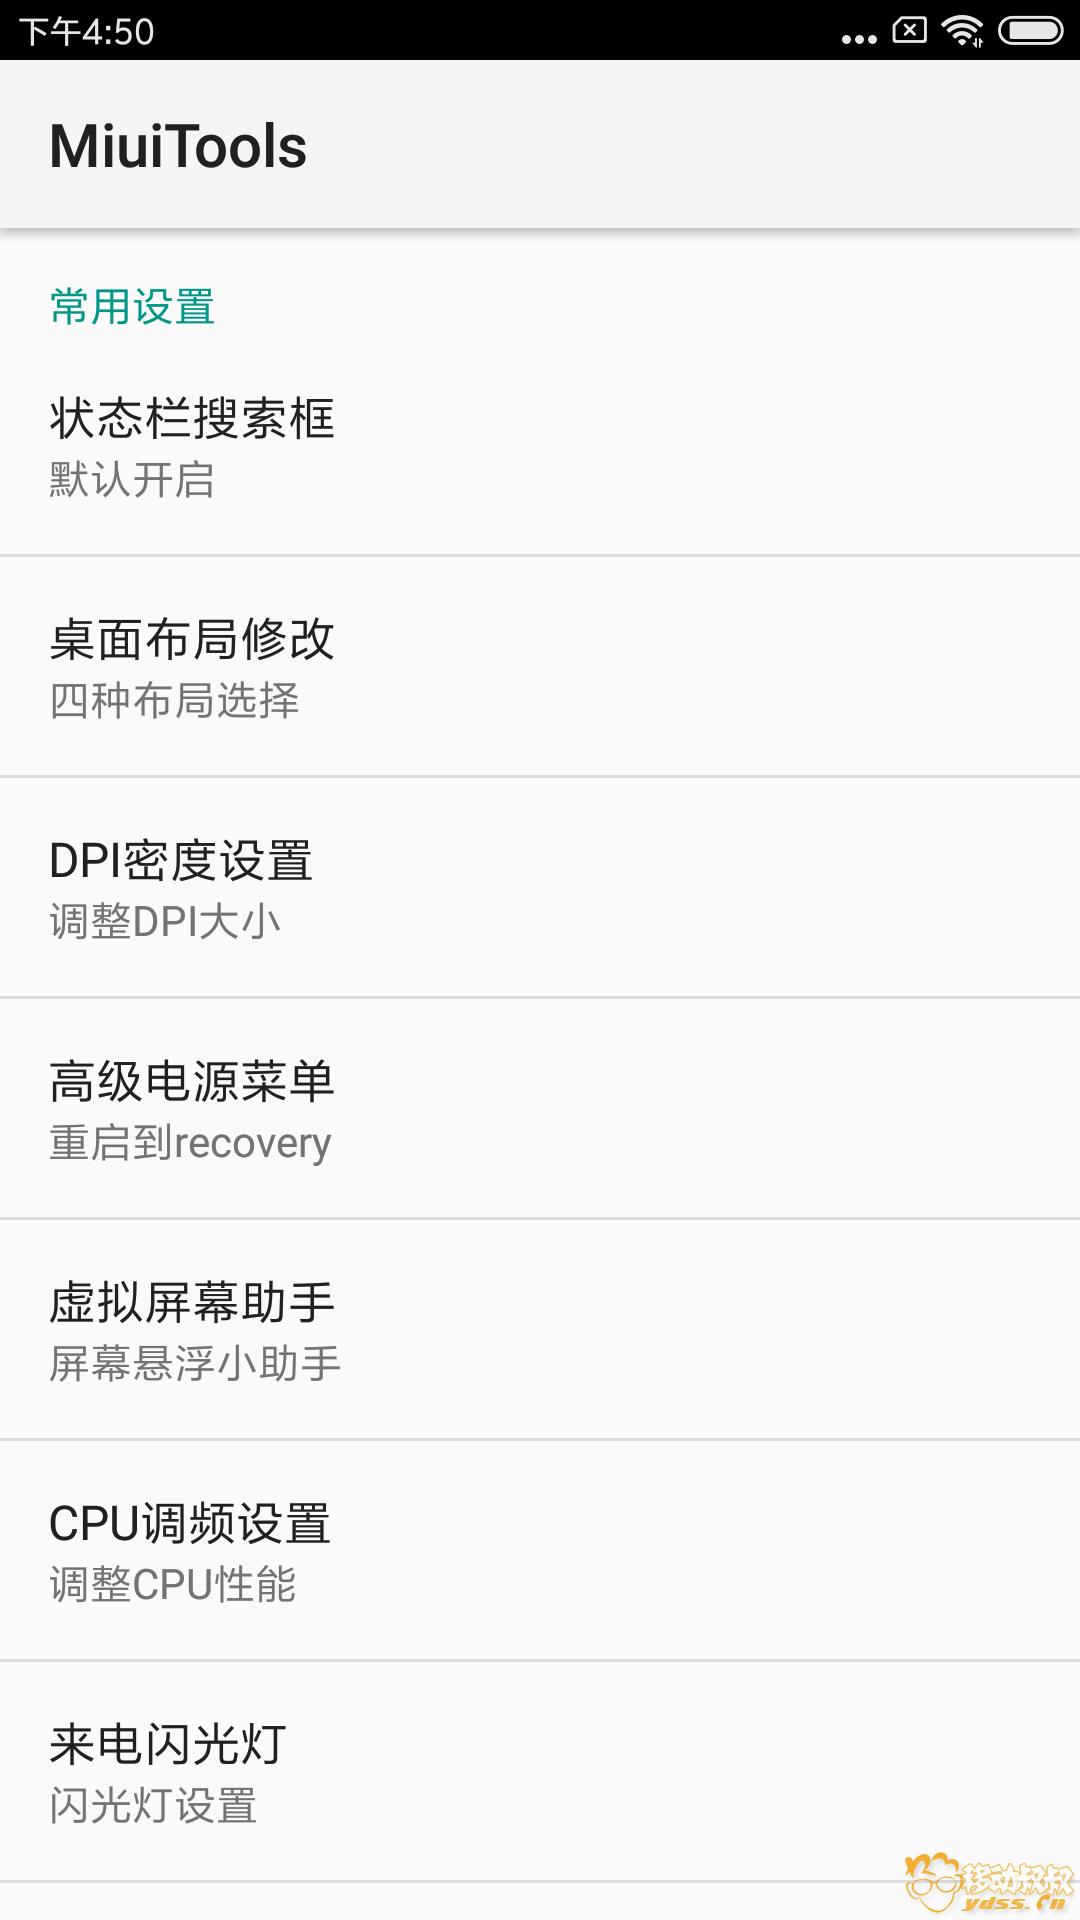 Screenshot_2018-08-10-16-50-17-326_com.anzhi.hwsettings.png